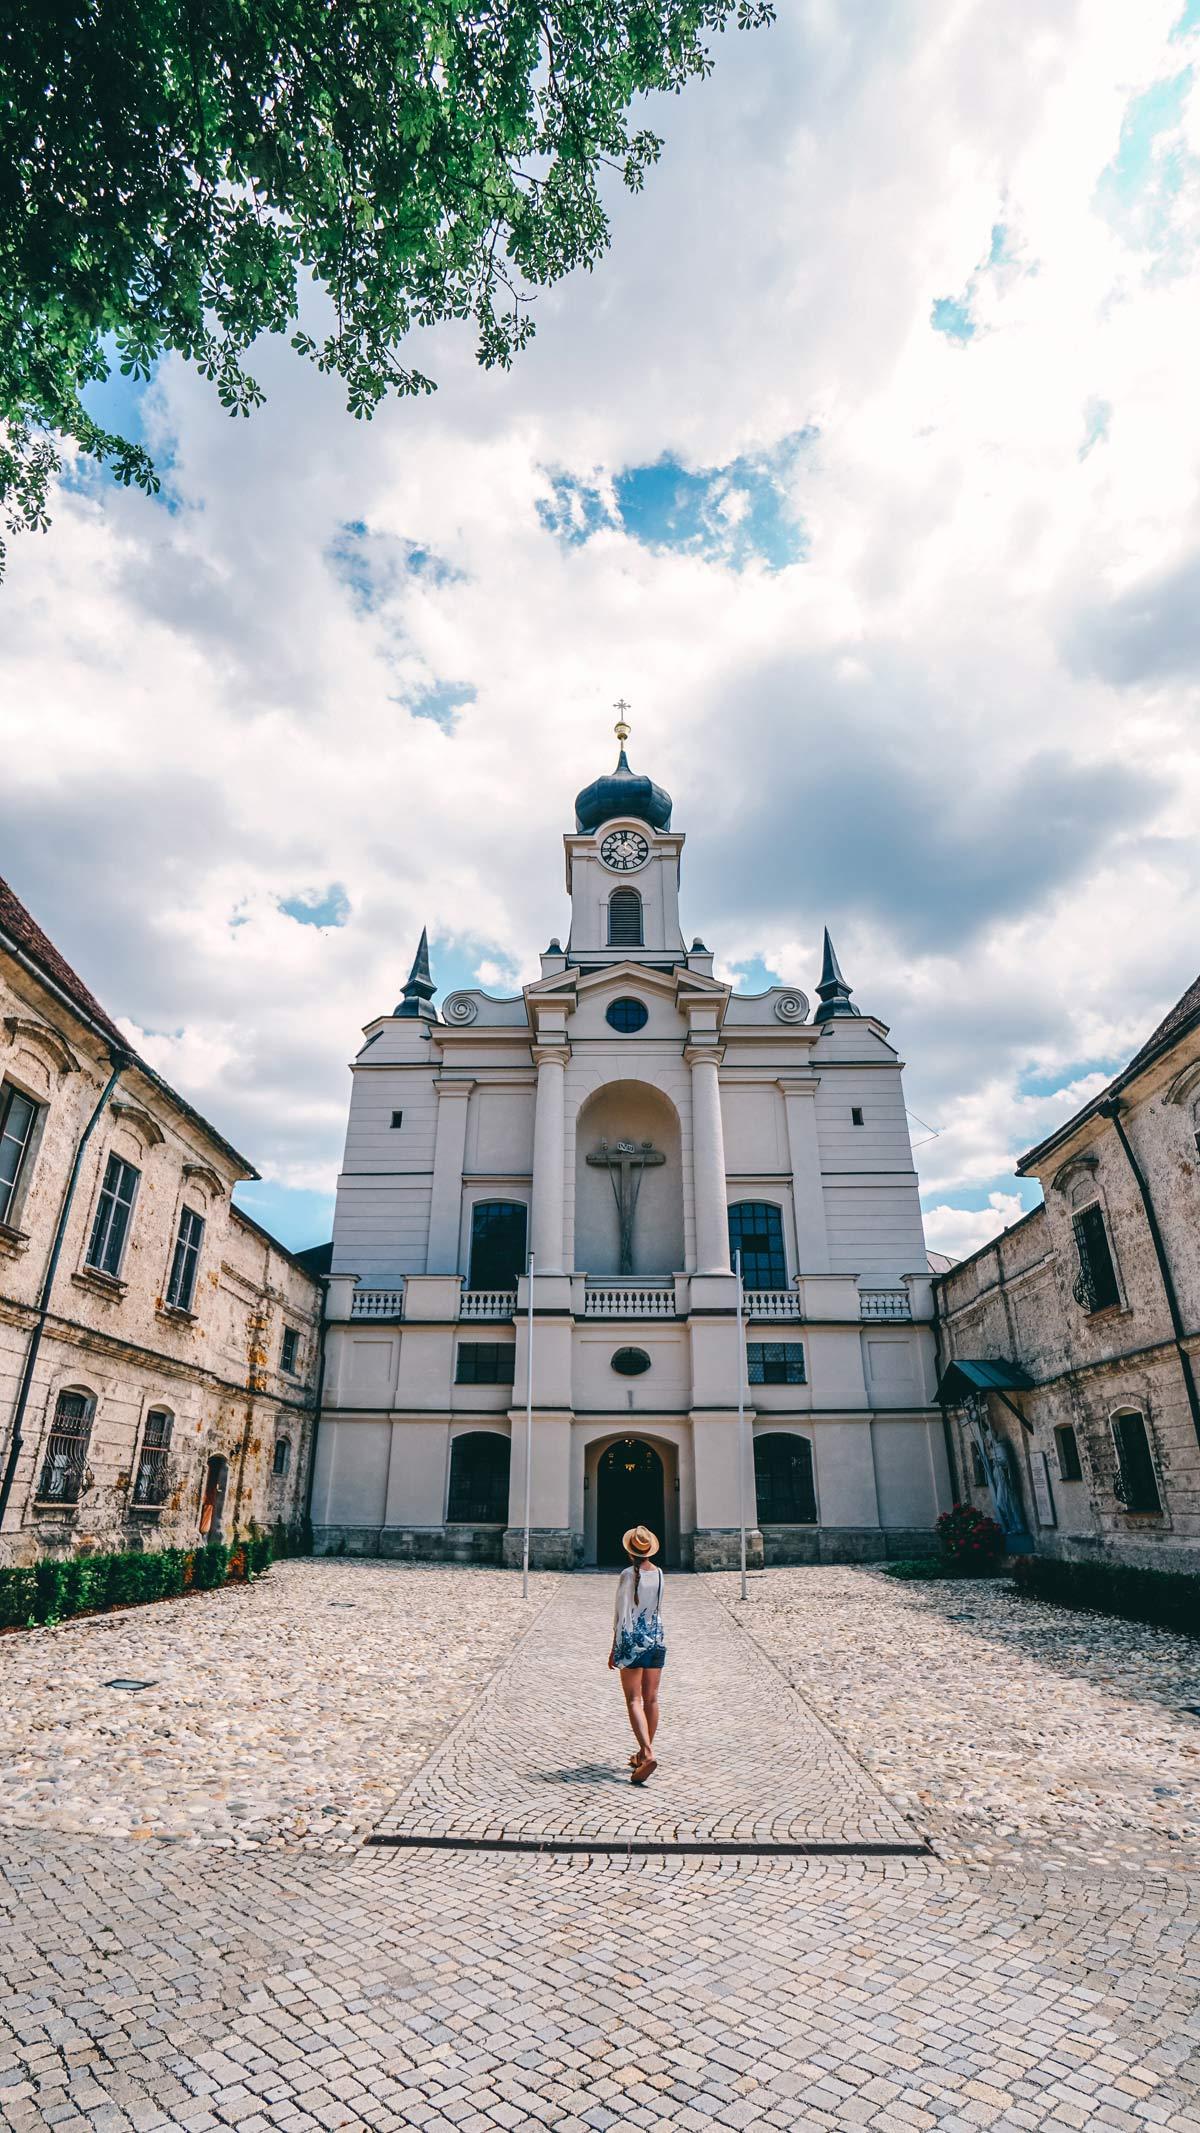 Kloster Raitenhaslach Kirche Aussen